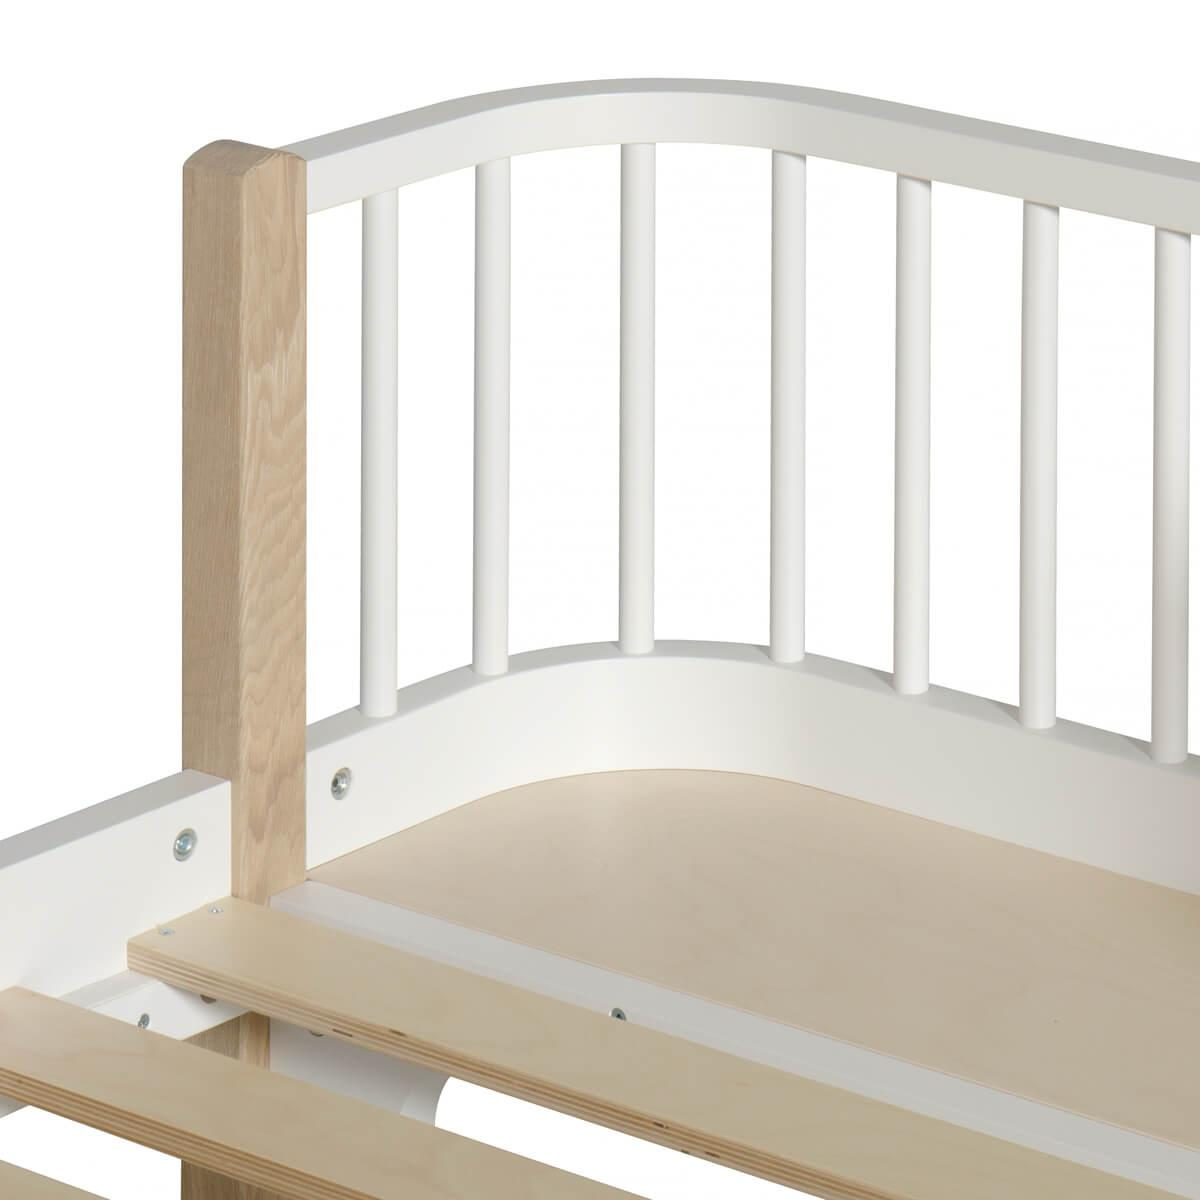 Lit bas évolutif 90x200cm WOOD ORIGINAL Oliver Furniture blanc-chêne